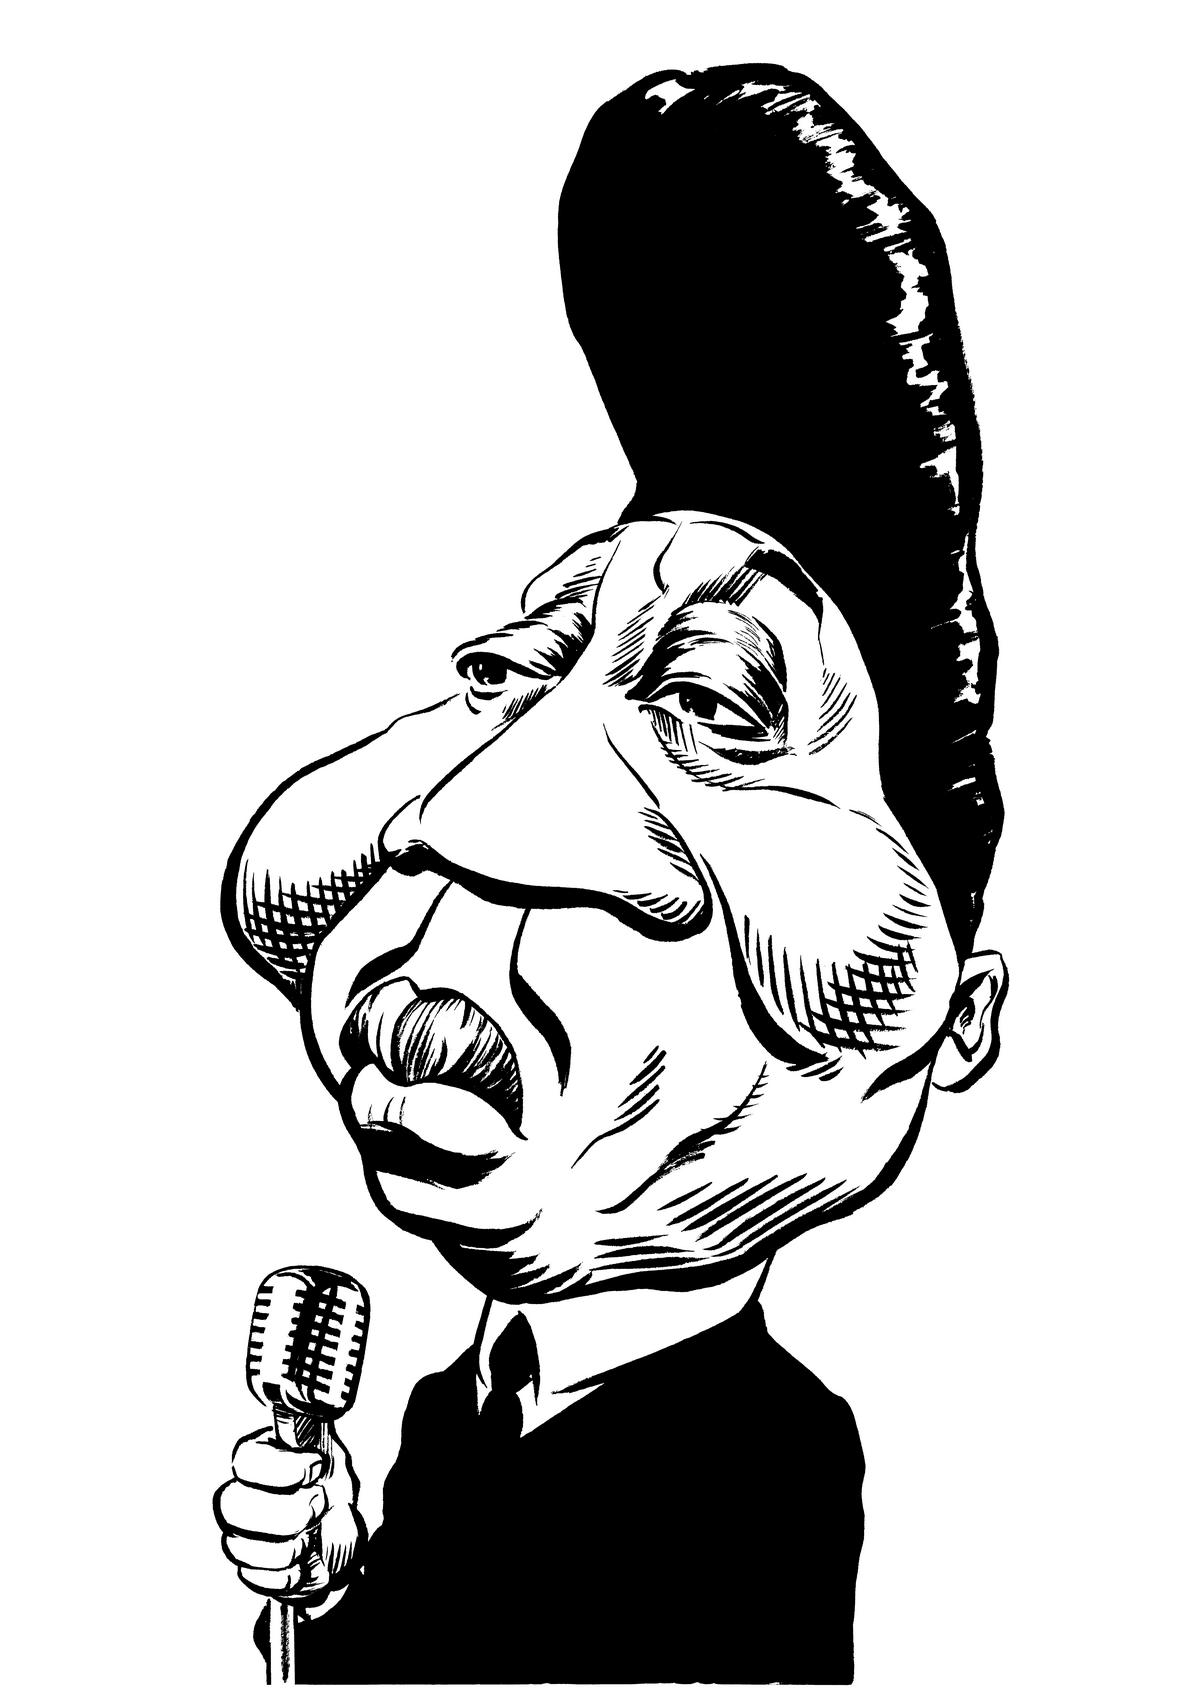 Muddy Waters caricature